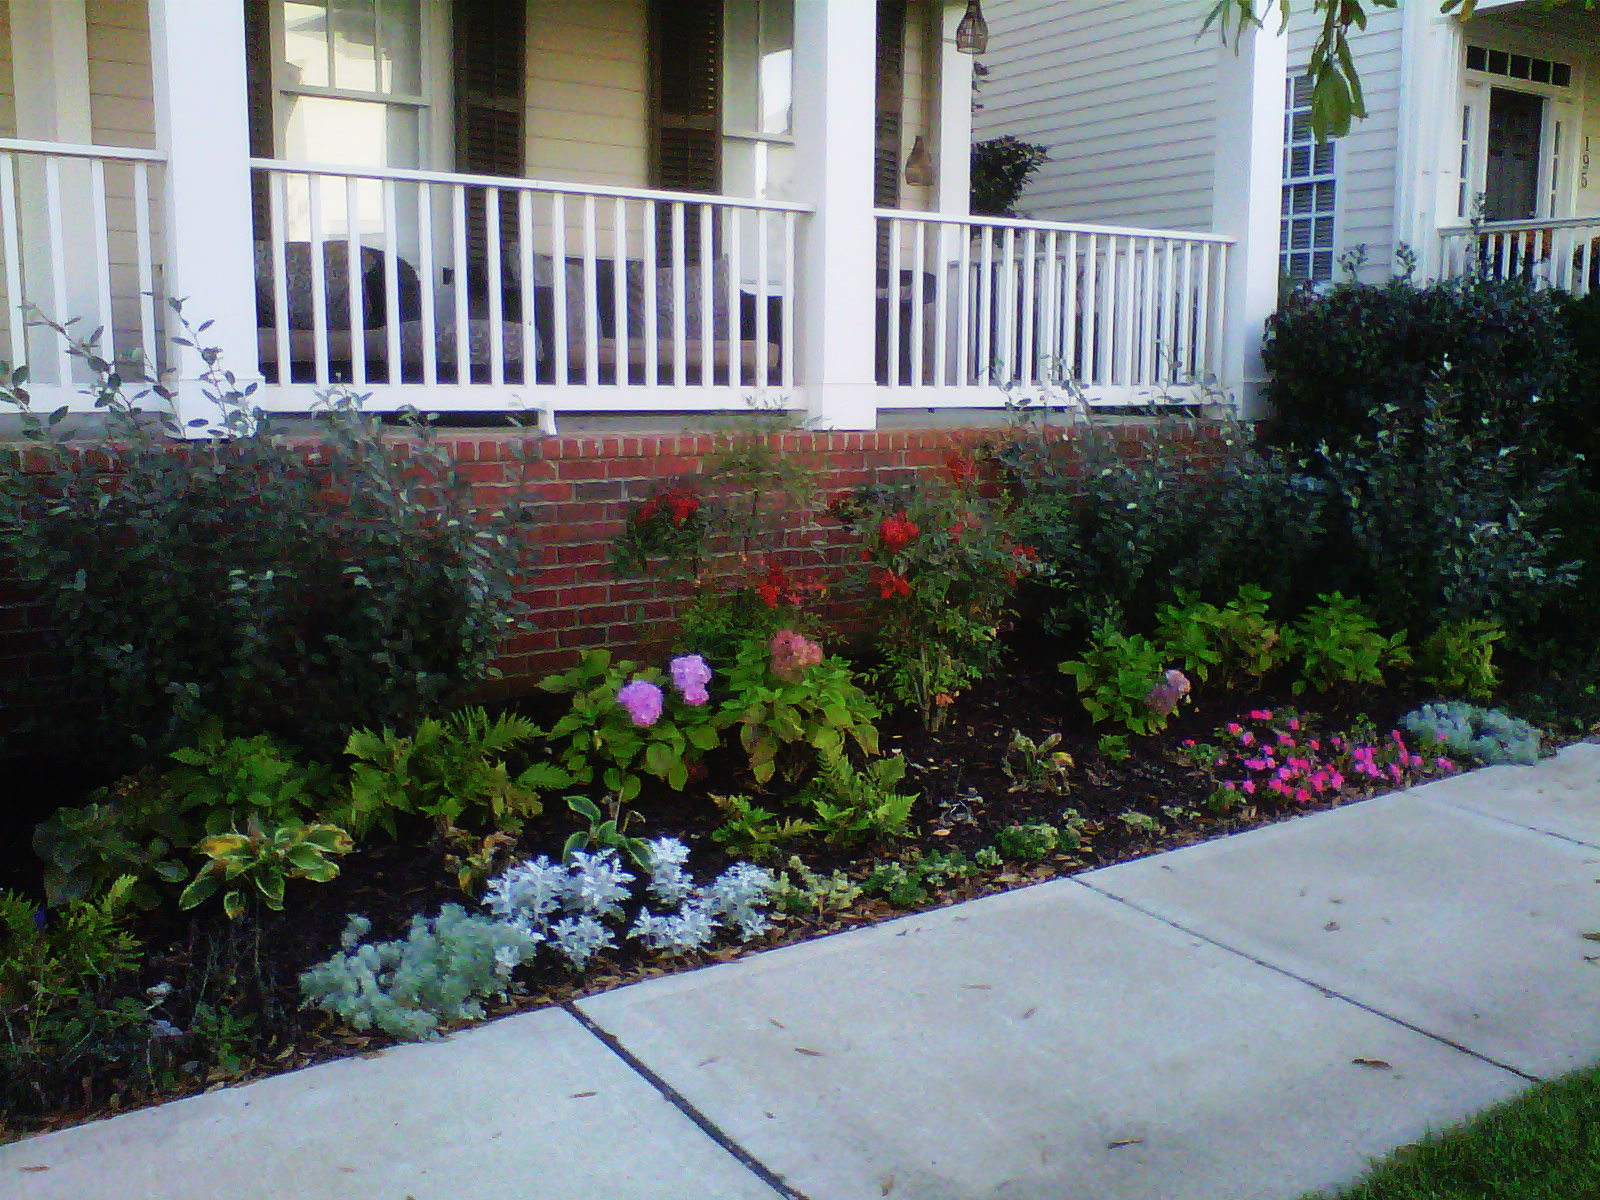 Justin Stelter Landscape Gardening - Modern Suburban Landscaping - 12591734293_feaeed09d8_o.jpg